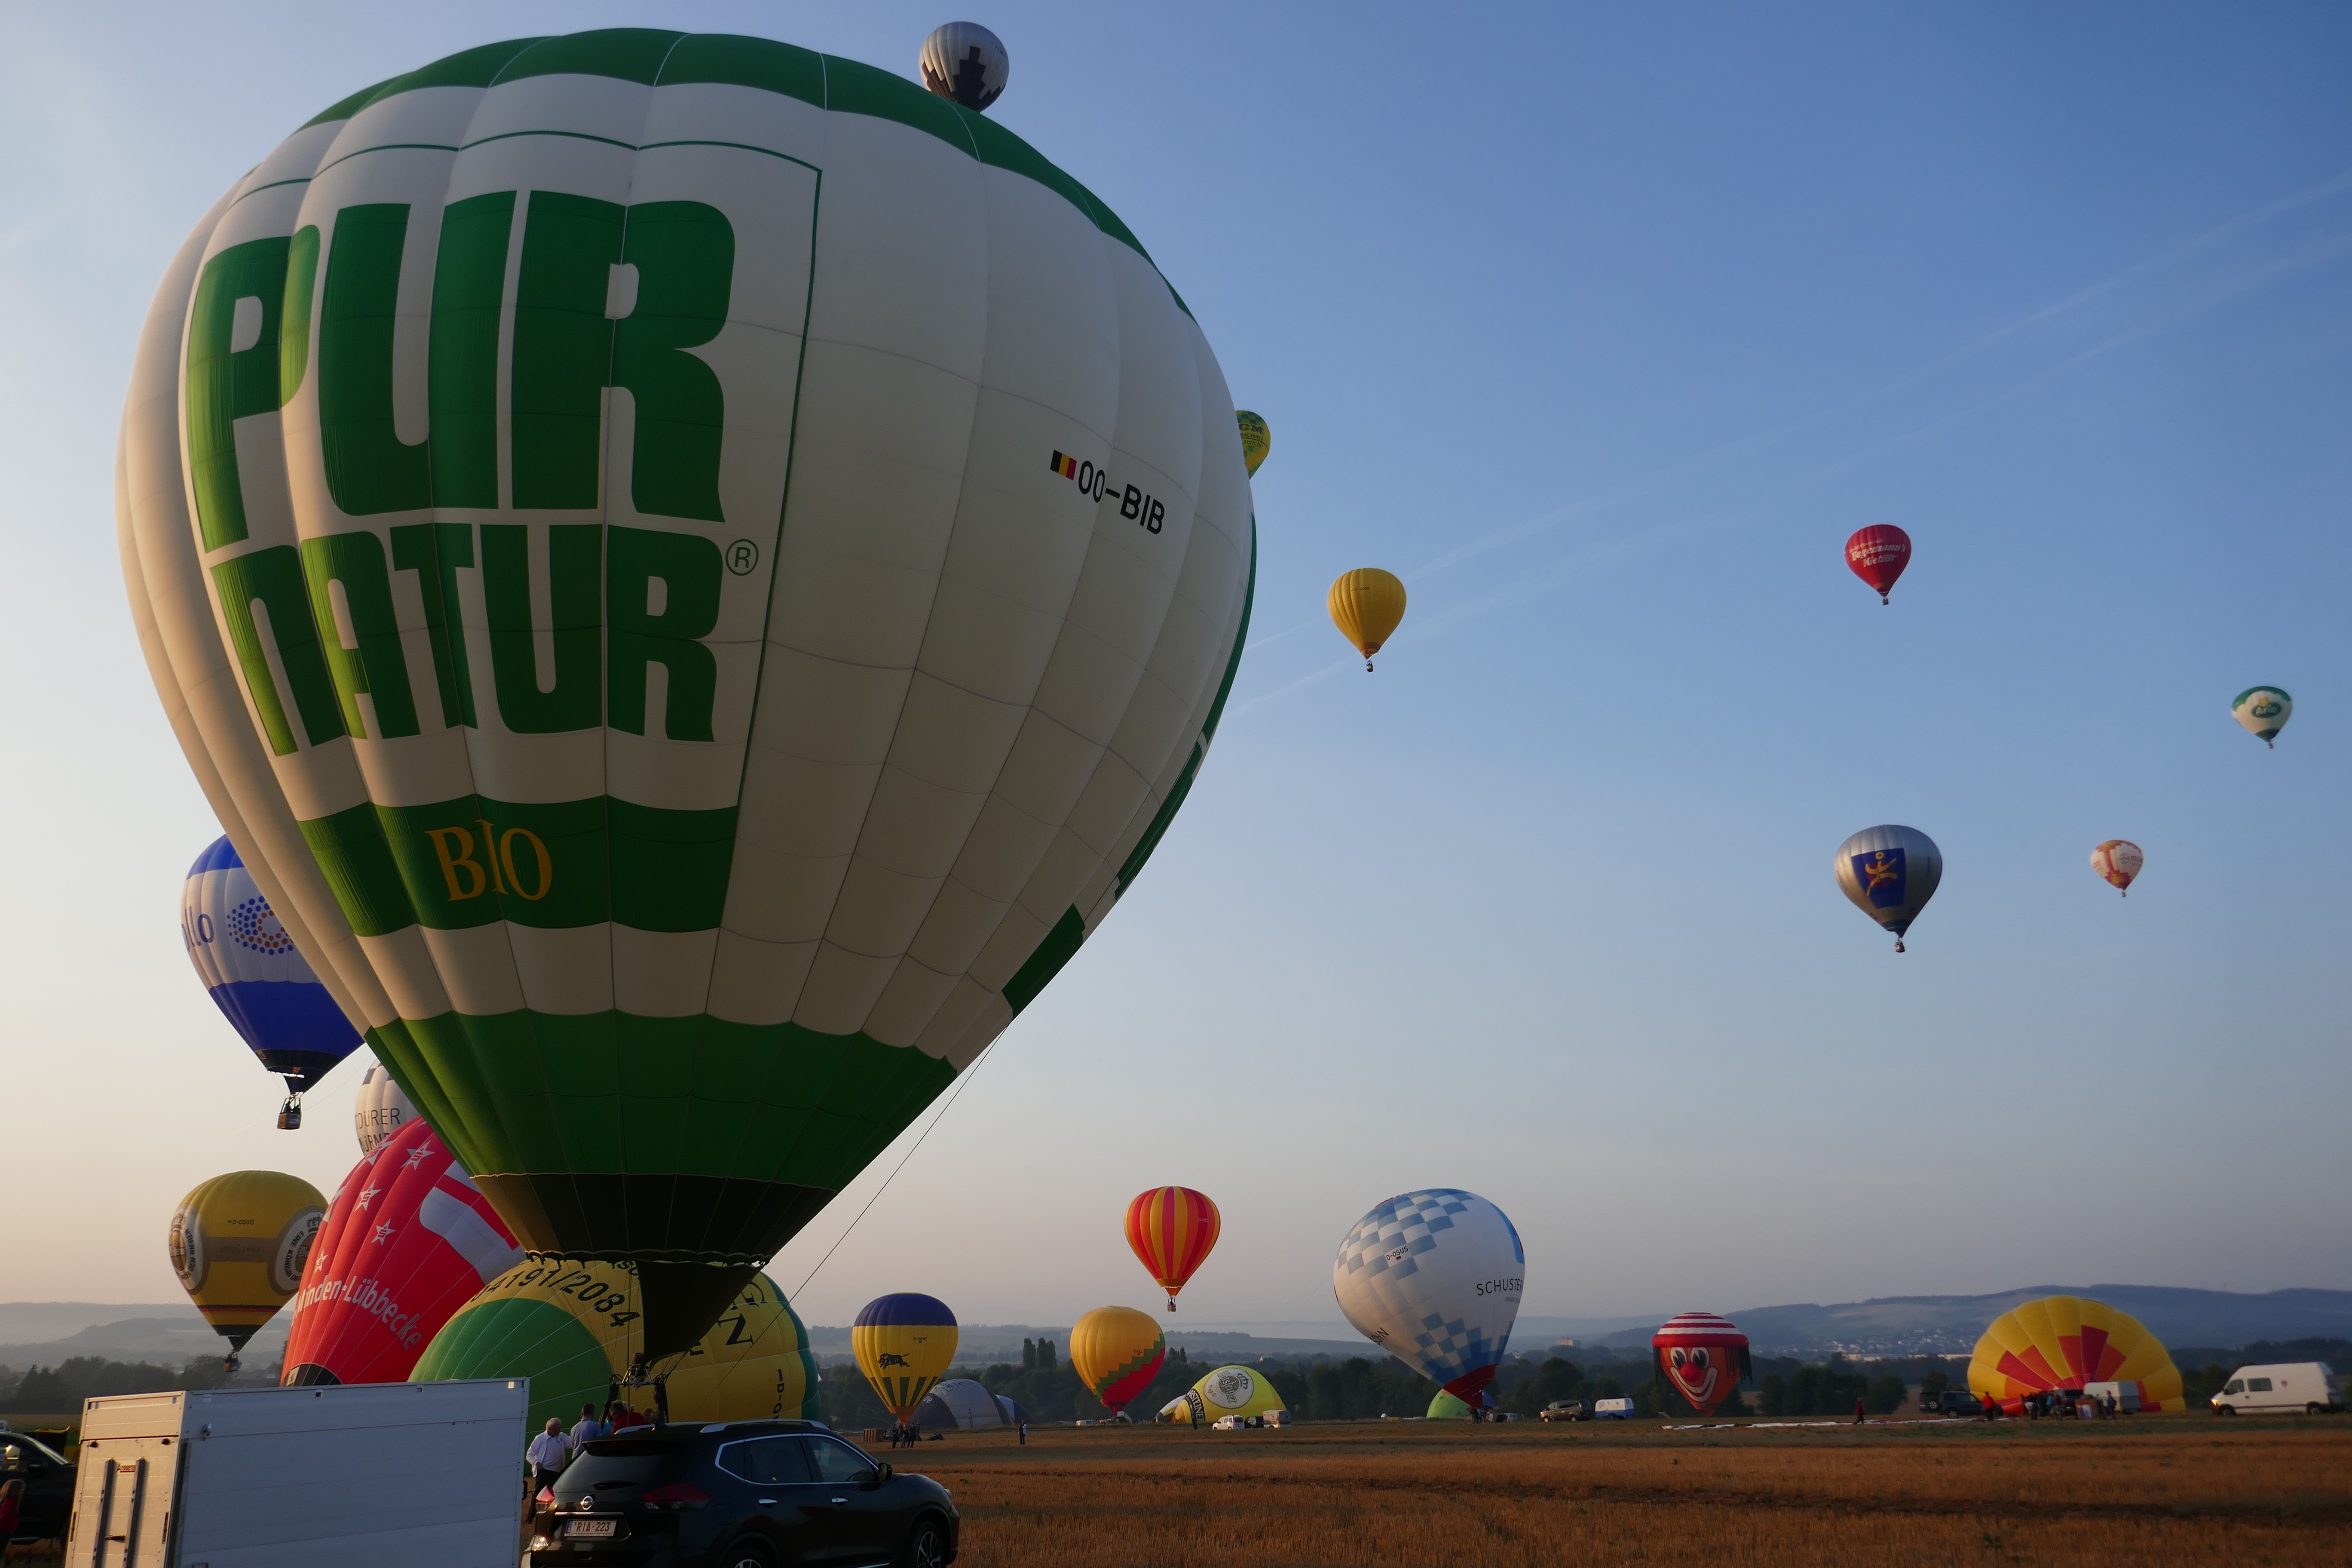 Ballonmeeting Dreamballooning